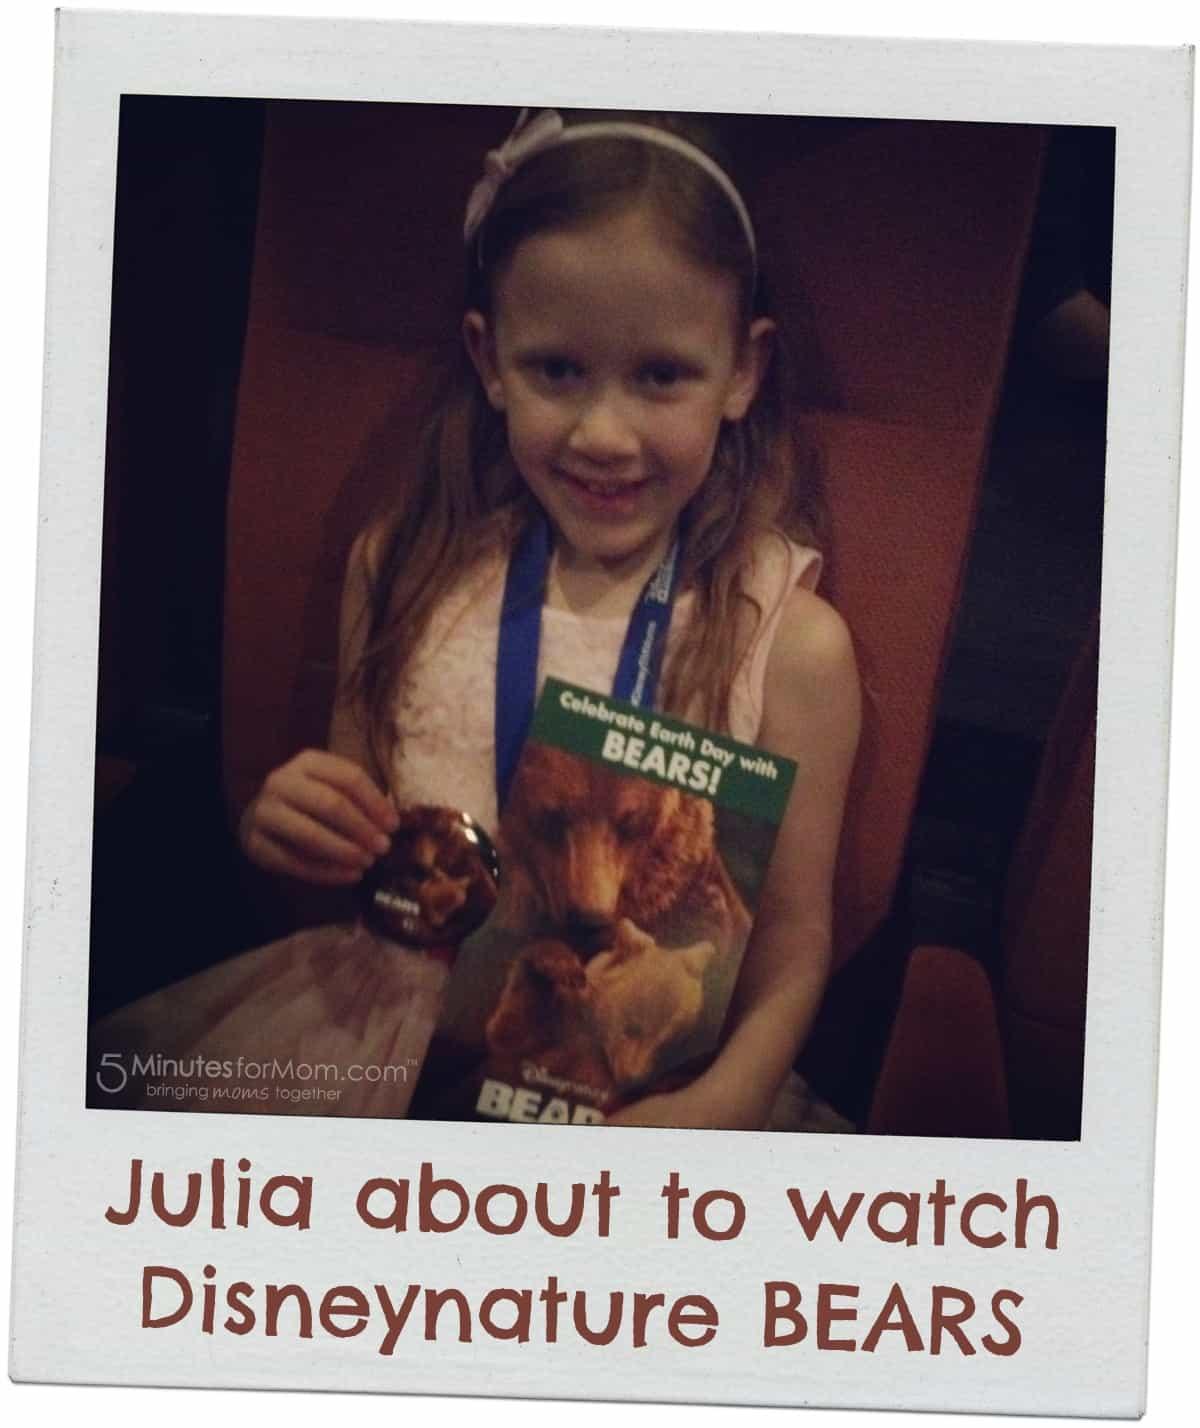 Julia watching Disneynature BEARS